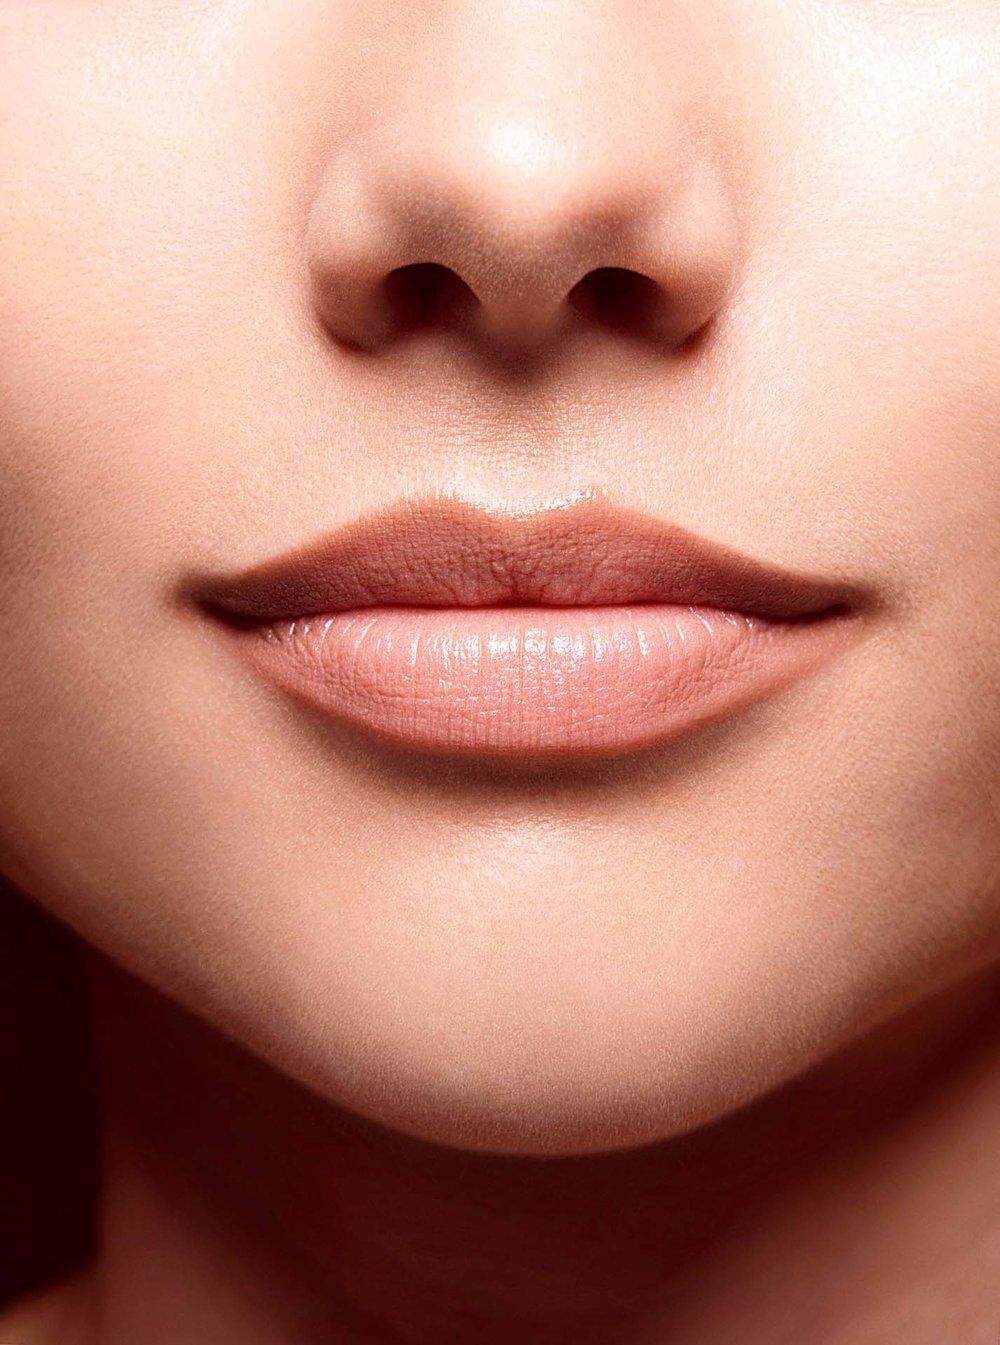 Lips 2 0003-1.jpg